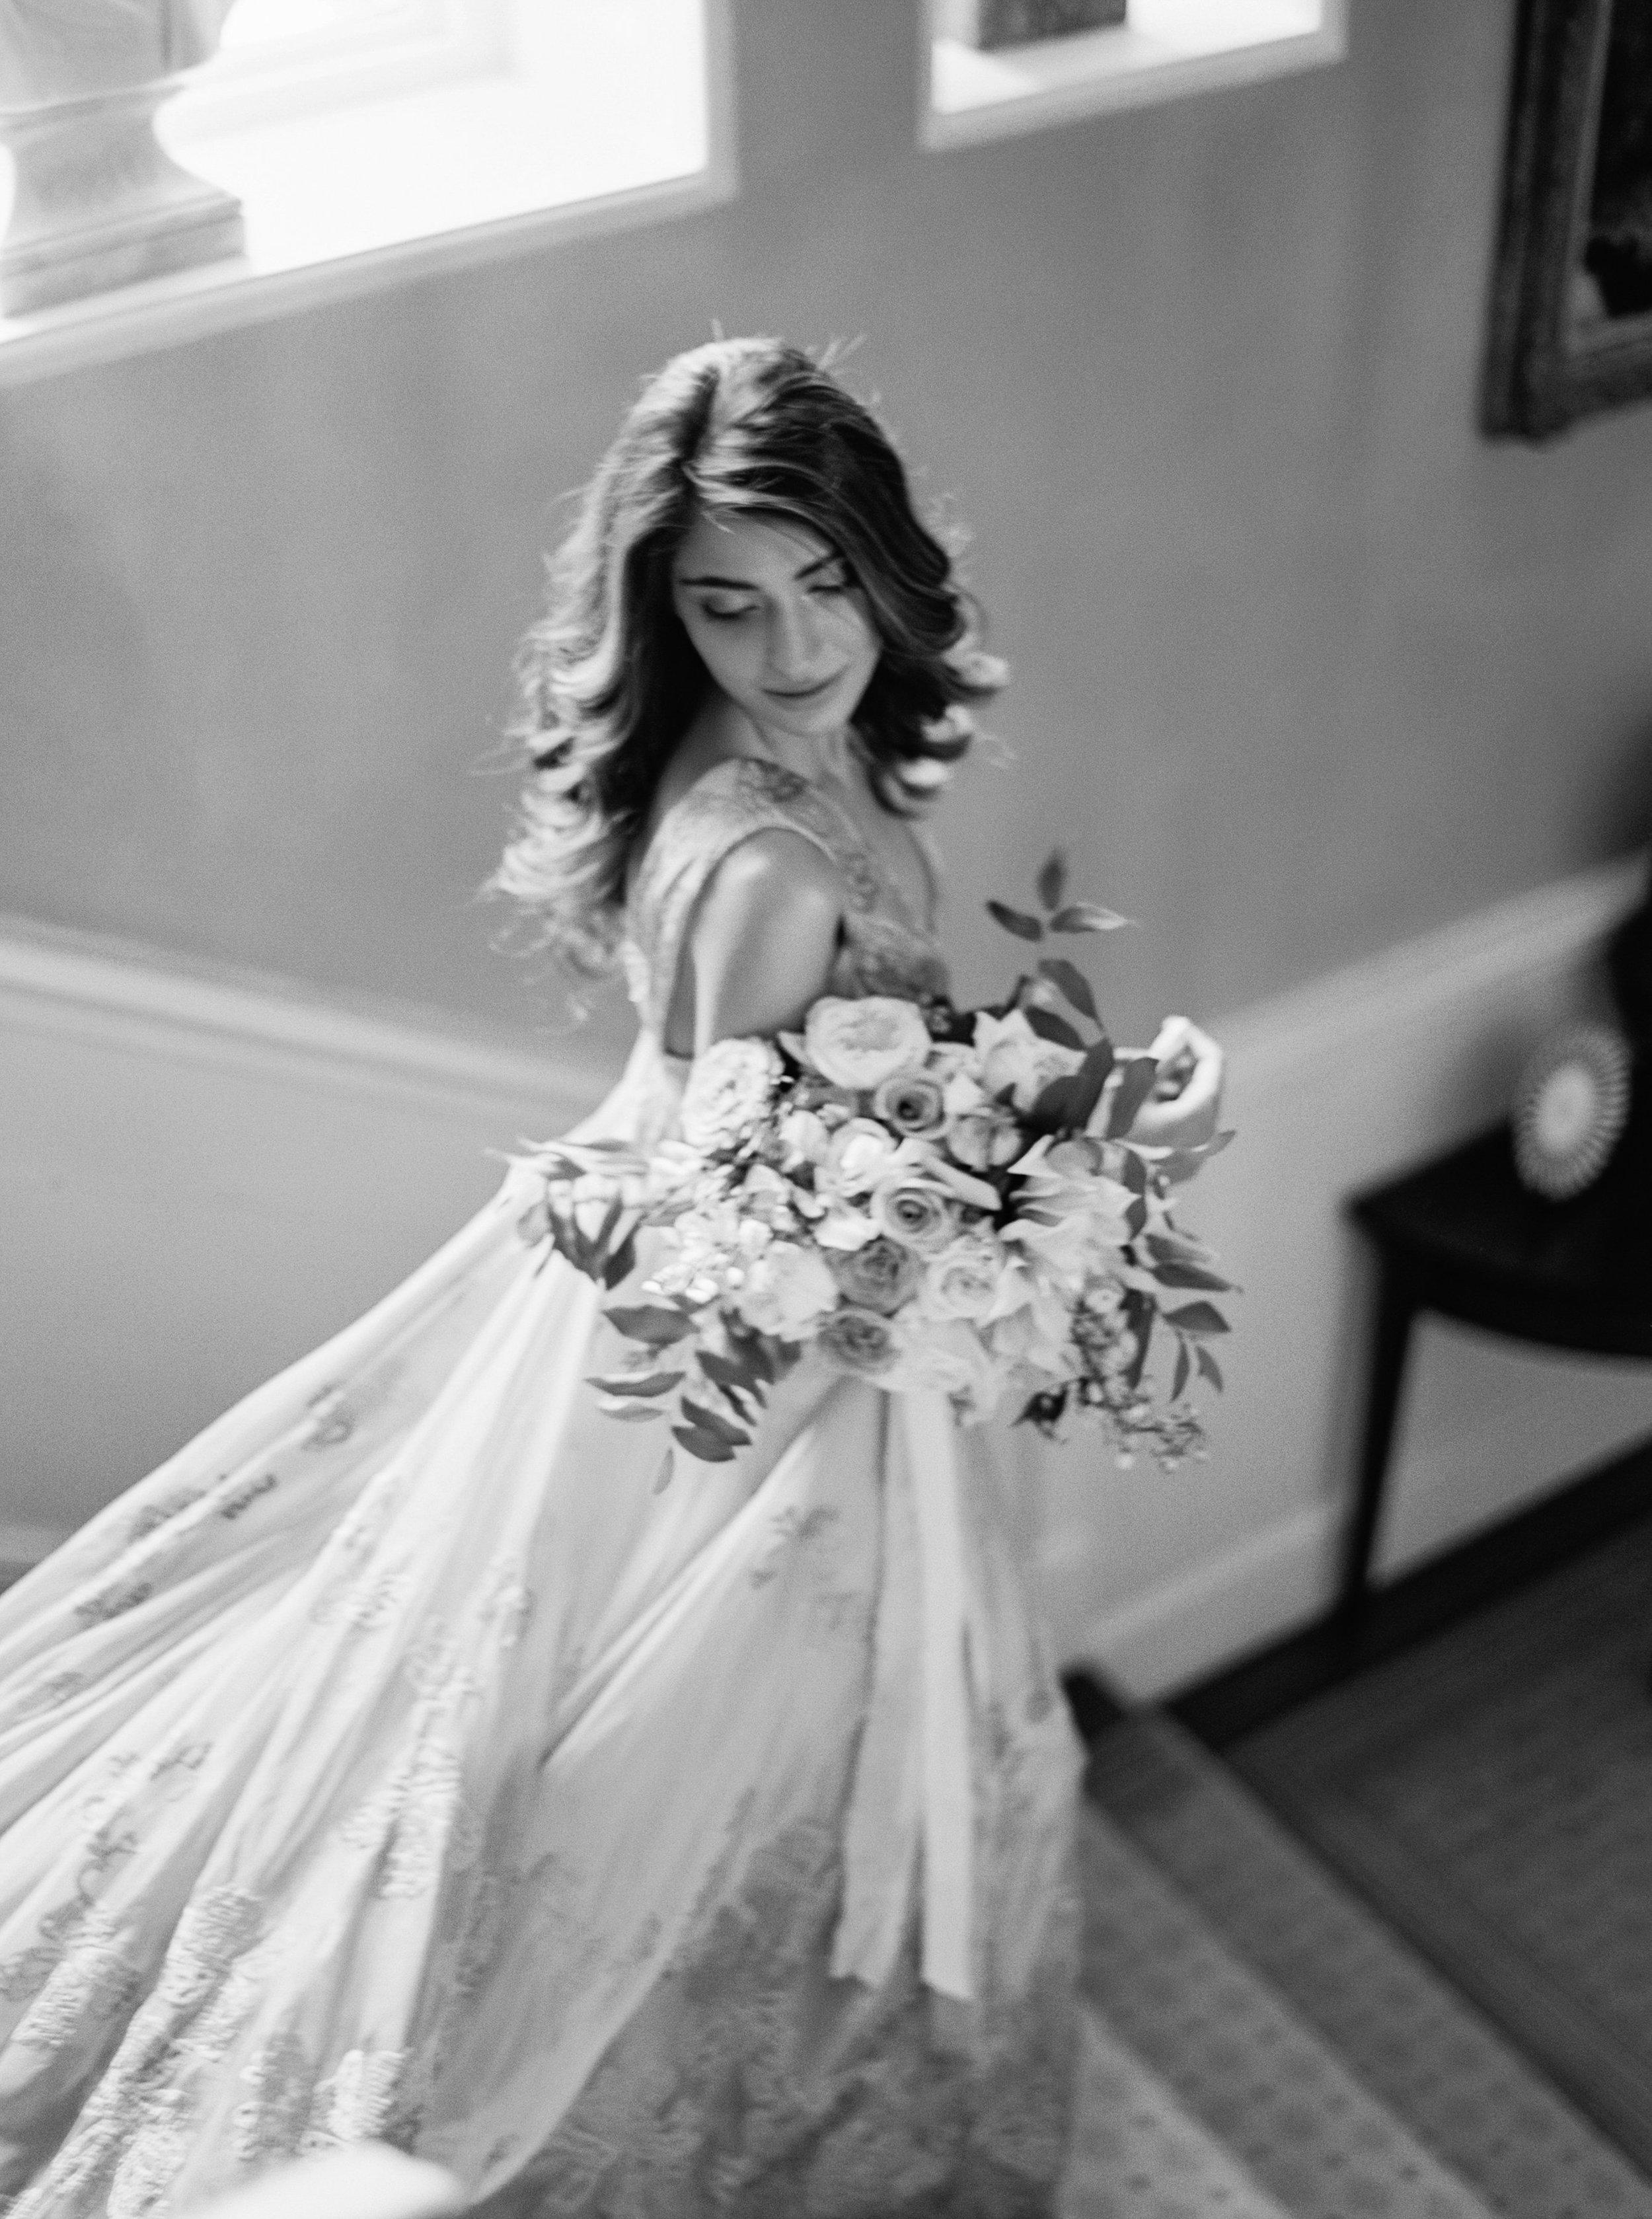 MelissaBlytheFineArtPhotography-CornwellManor_-13.jpg